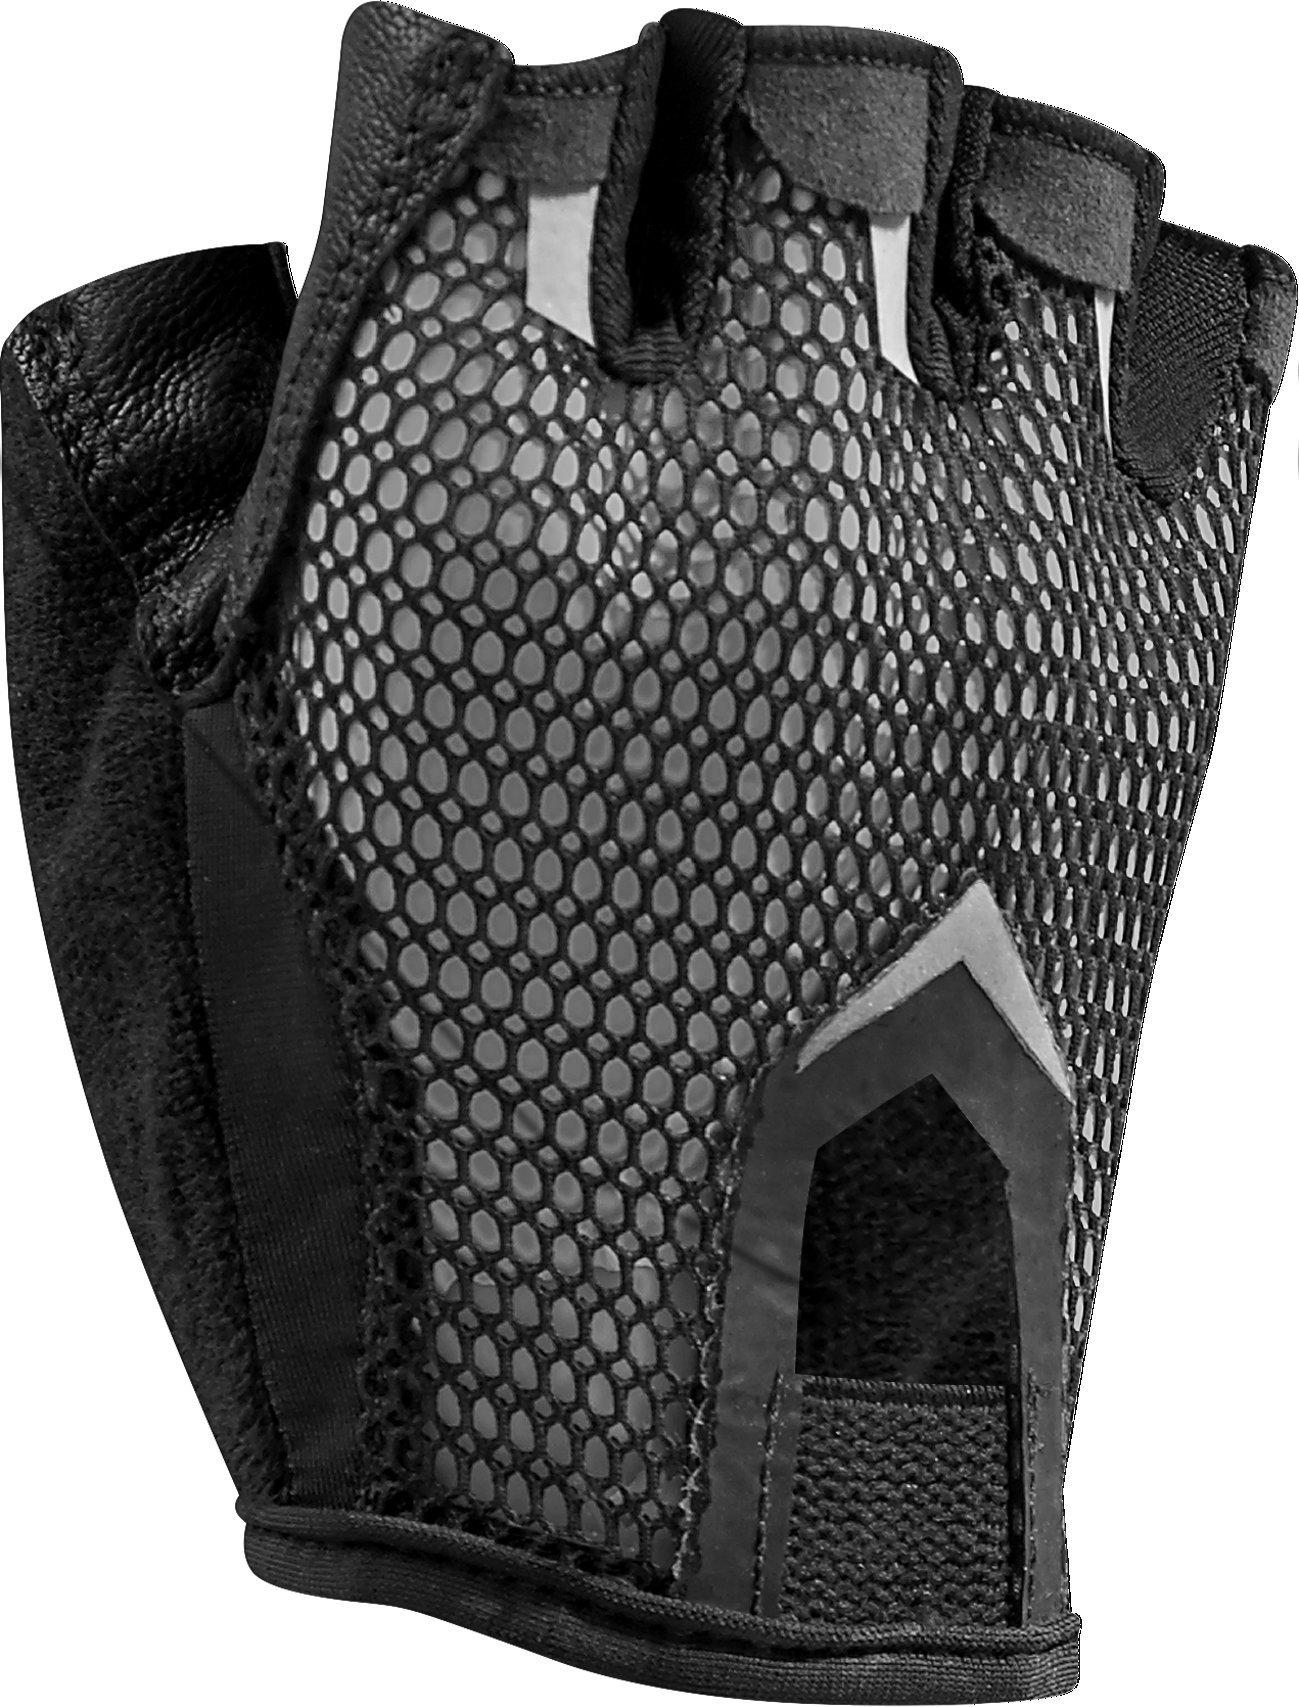 Under Armour Women's Resistor Training Gloves, Black (001), Large